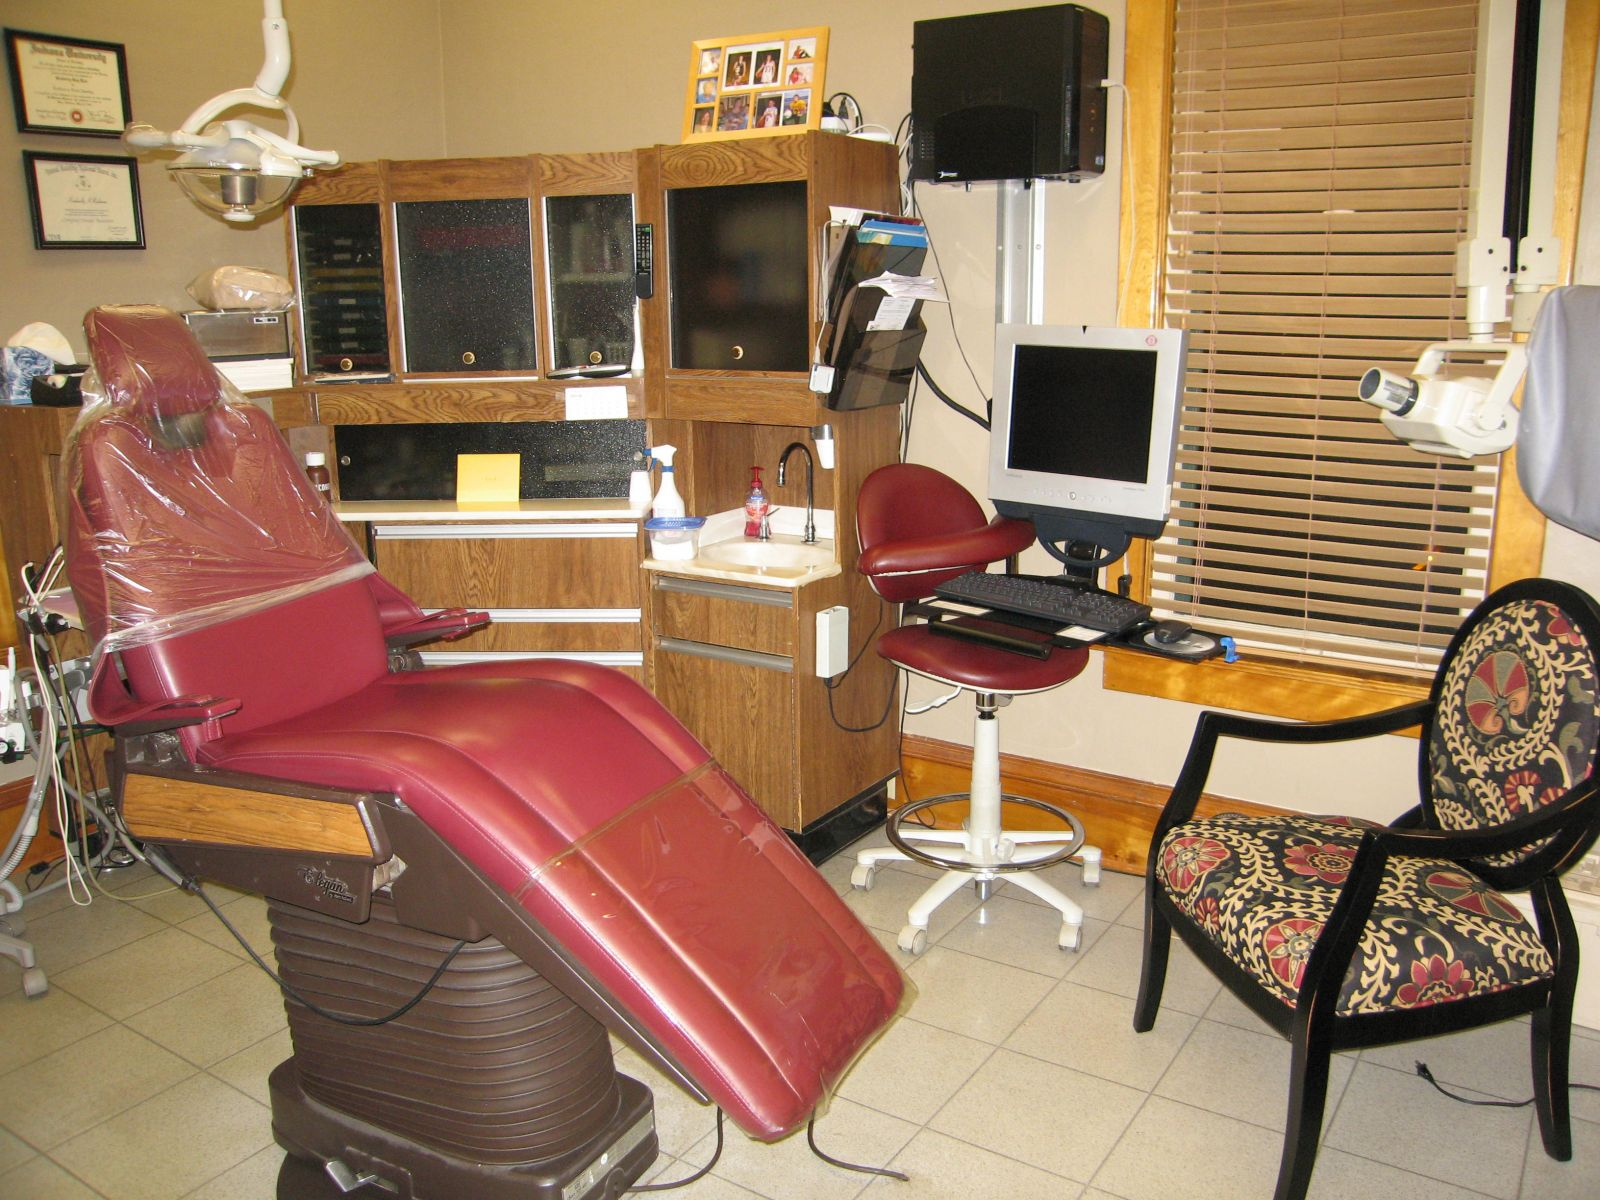 Pulver Dental Care: Don Pulver, DDS image 3